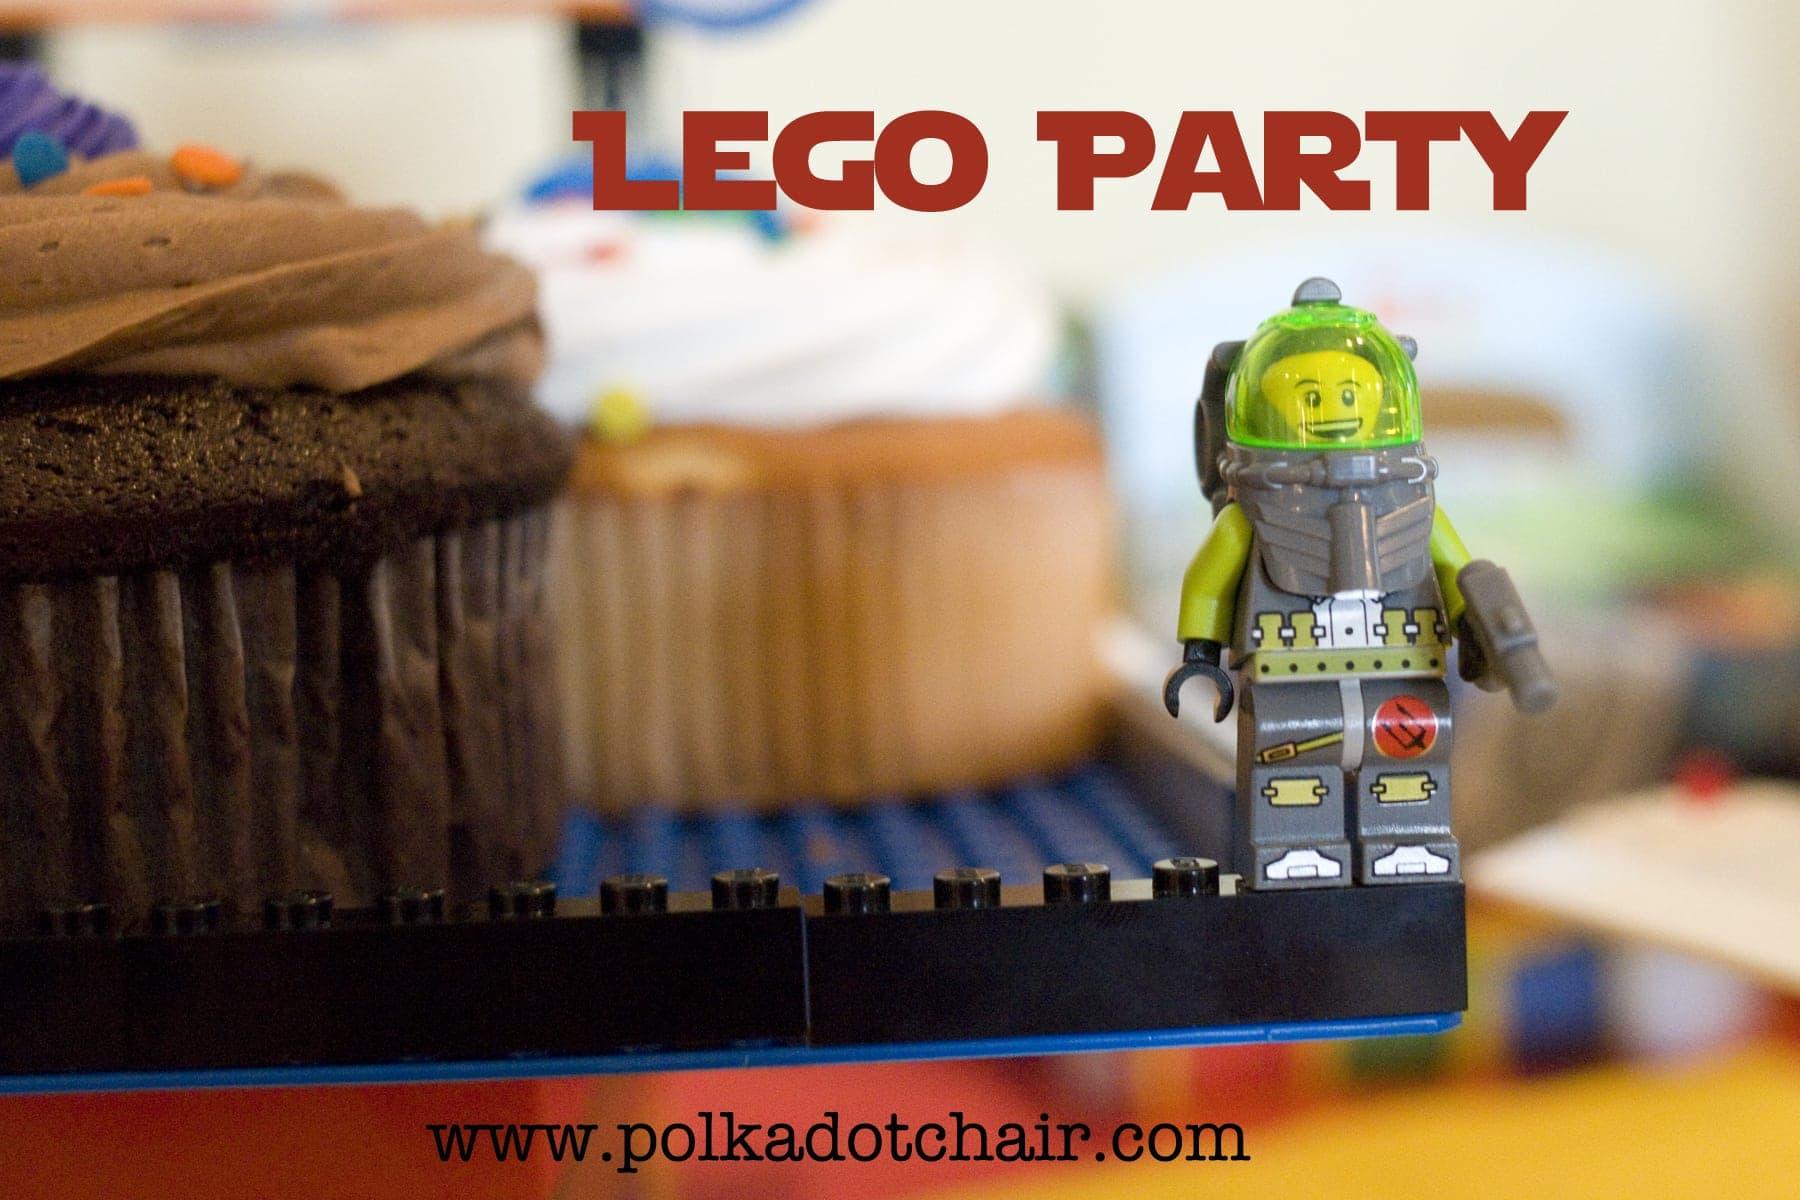 Lego Themed Birthday Party Food Ideas